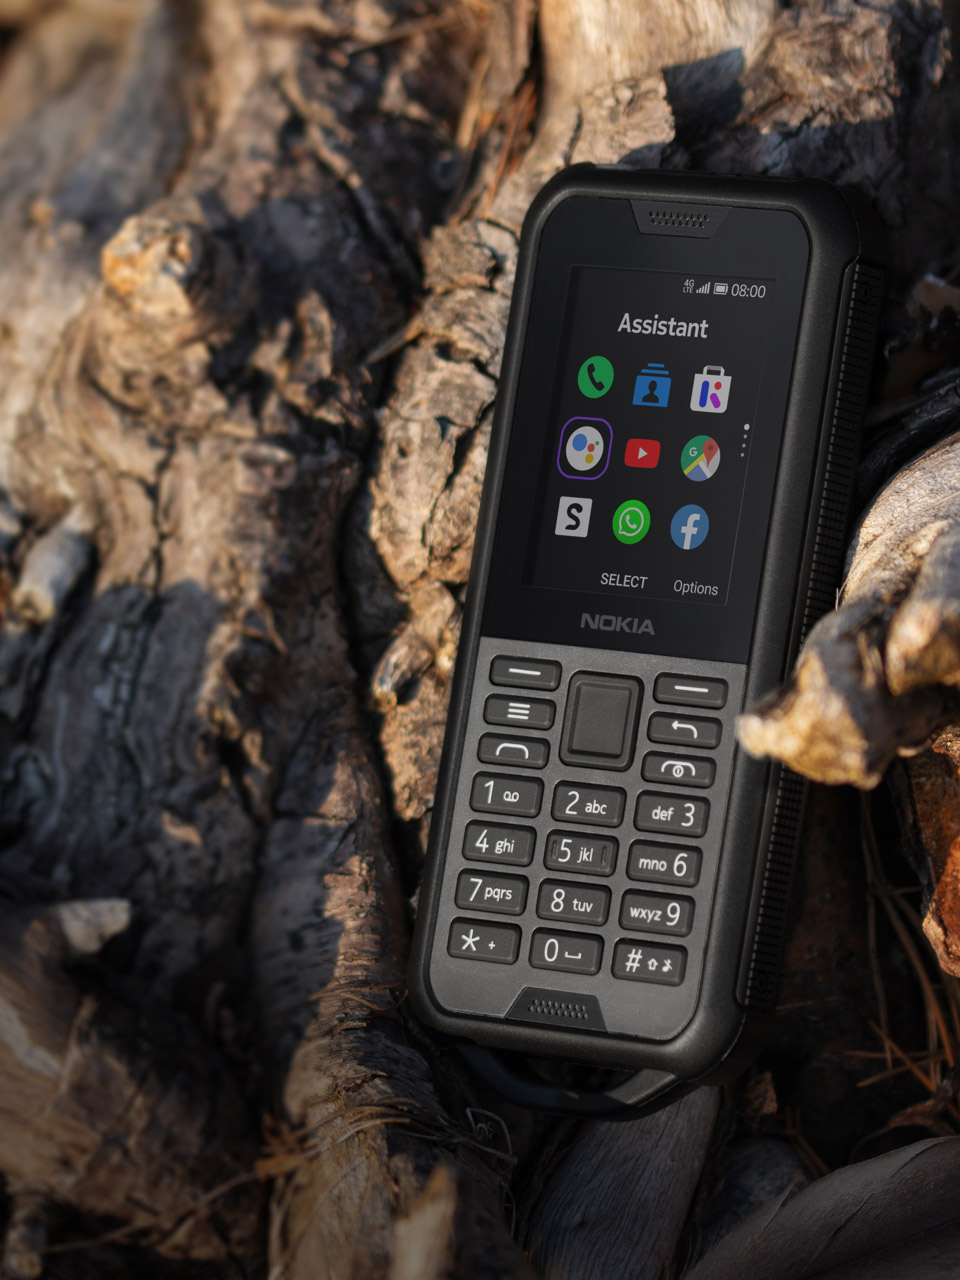 Nokia 800 Tough Phones